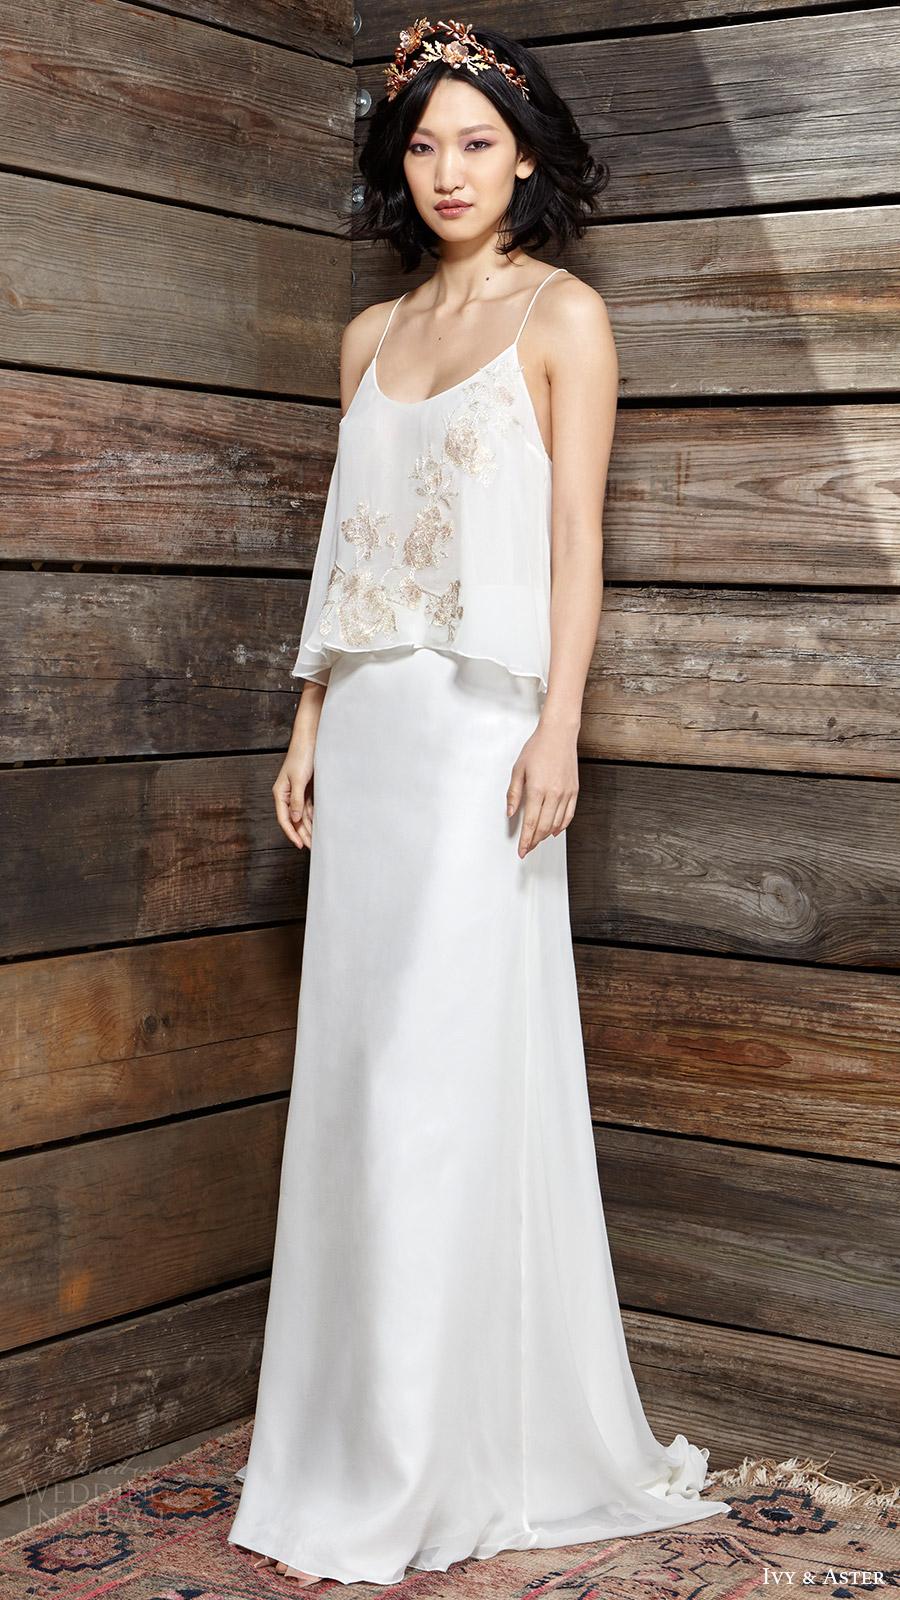 ivy aster bridal spring 2017 two piece wedding dress hazel top georgia skirt